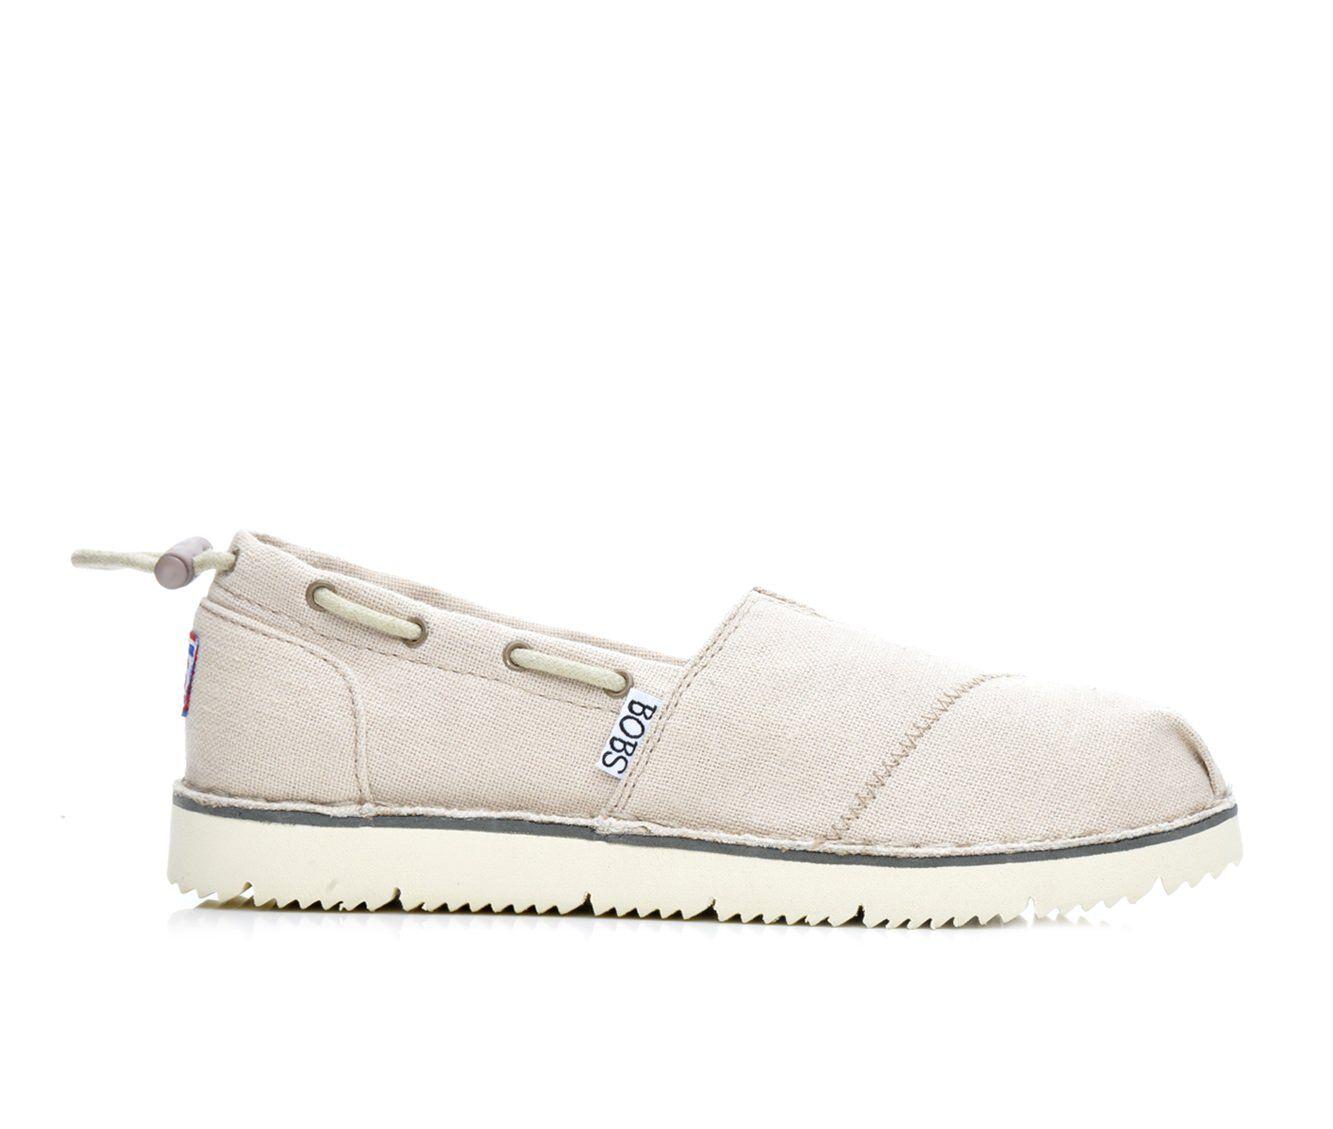 Women's BOBS Chill Flex Hot2Trot 34314 Flatform Casual Shoes outlet classic sale marketable outlet with credit card exclusive cheap online P6CJJfkWQ